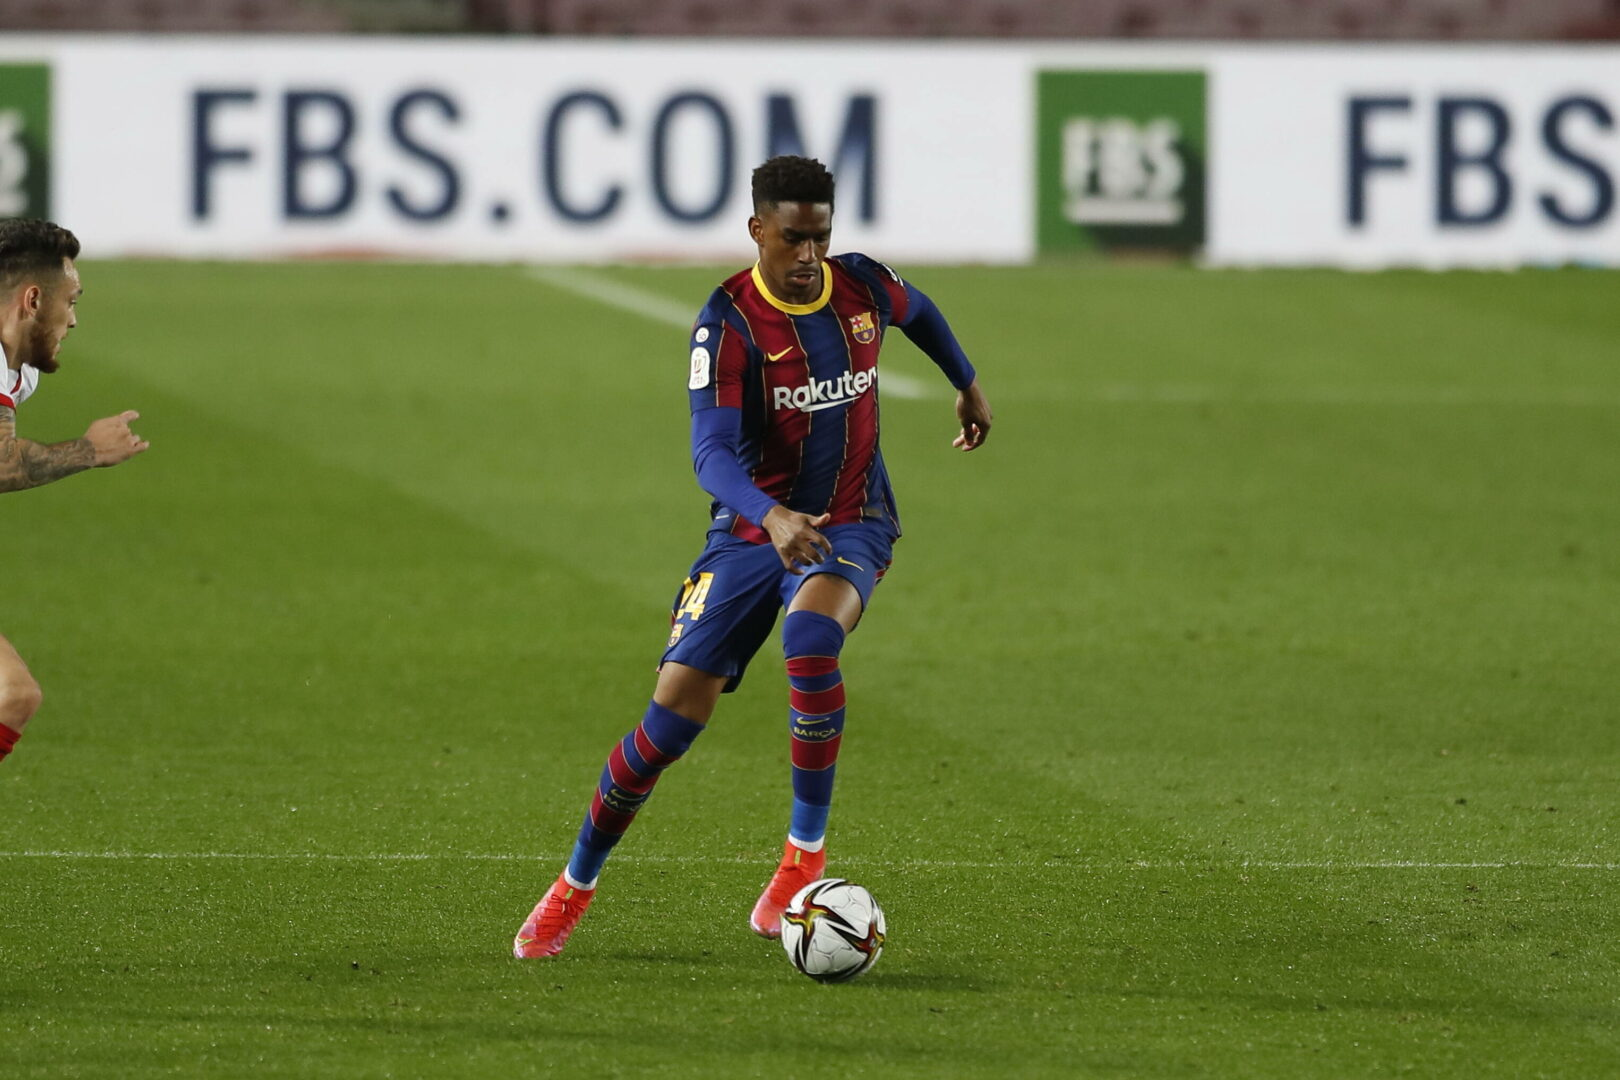 FC Barcelona: Junior Firpo vor Wechsel zu Leeds United